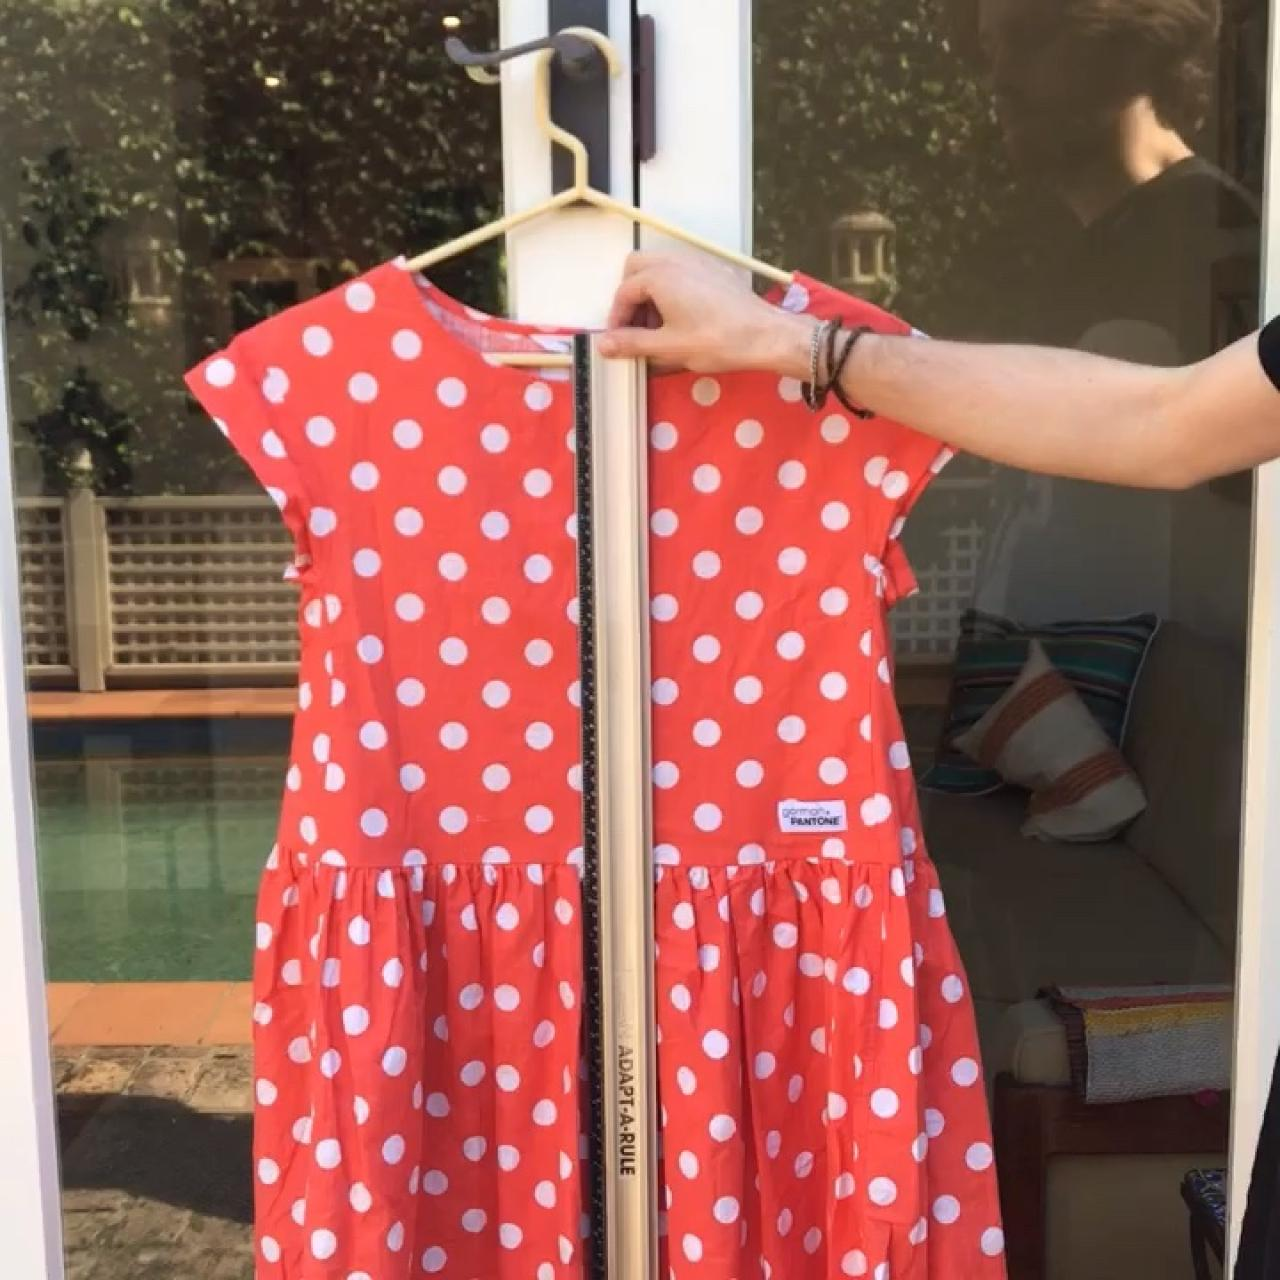 Gorman x Pantone beach dress Size 10, but a loose Depop